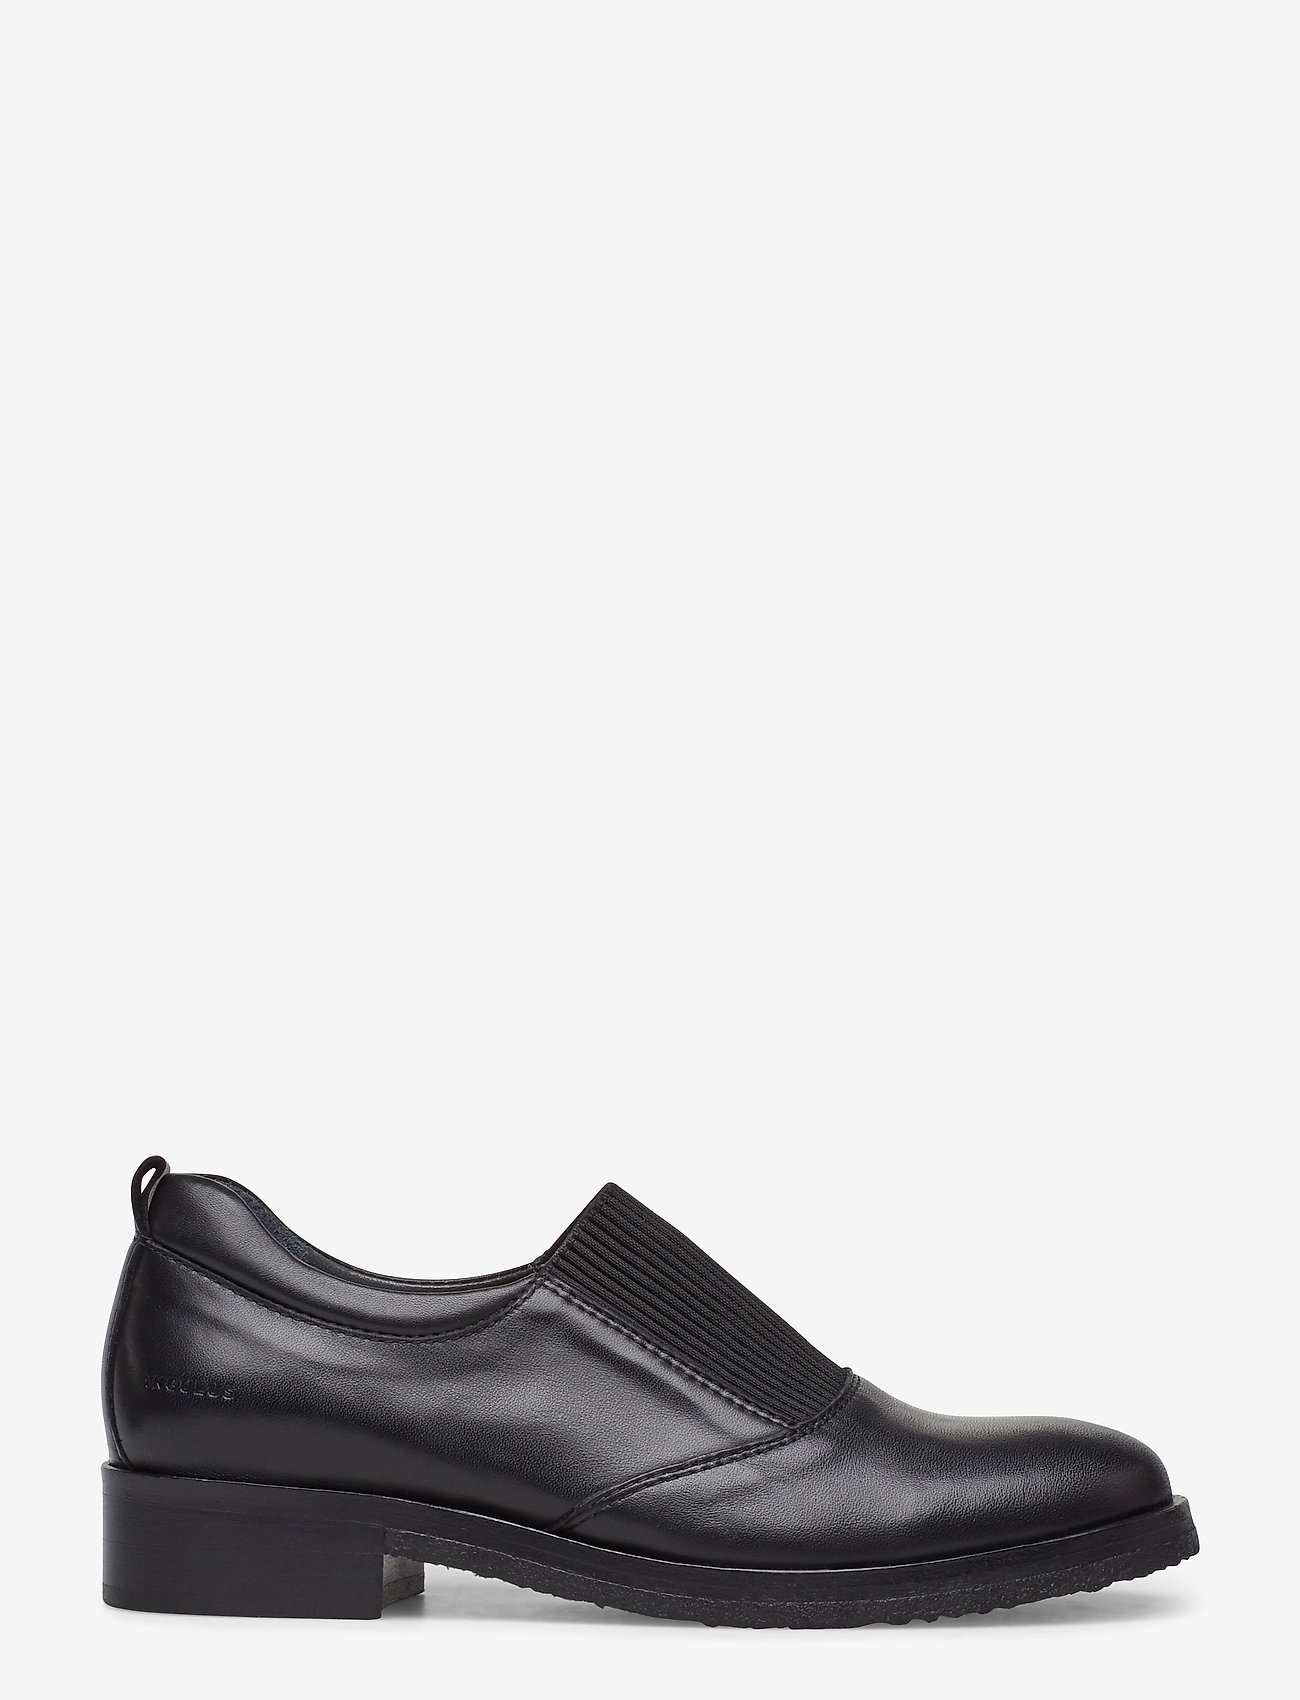 ANGULUS - Shoes - flat - with elastic - loaferit - 1604/019 black/black - 1